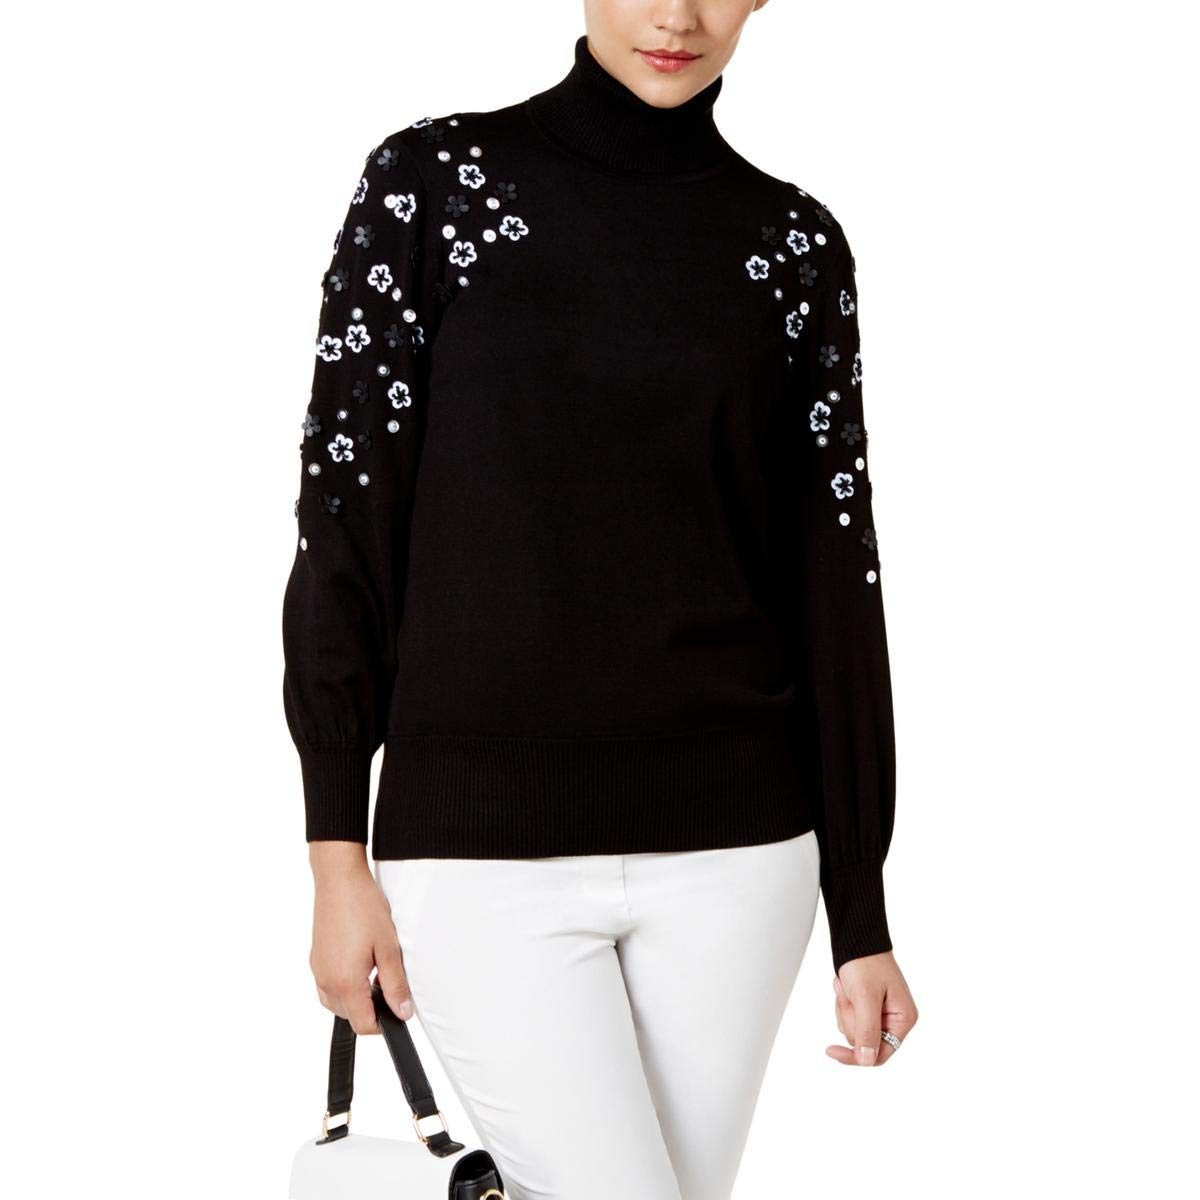 Deep Black Alfani Womens Knit Embellished Turtleneck Sweater